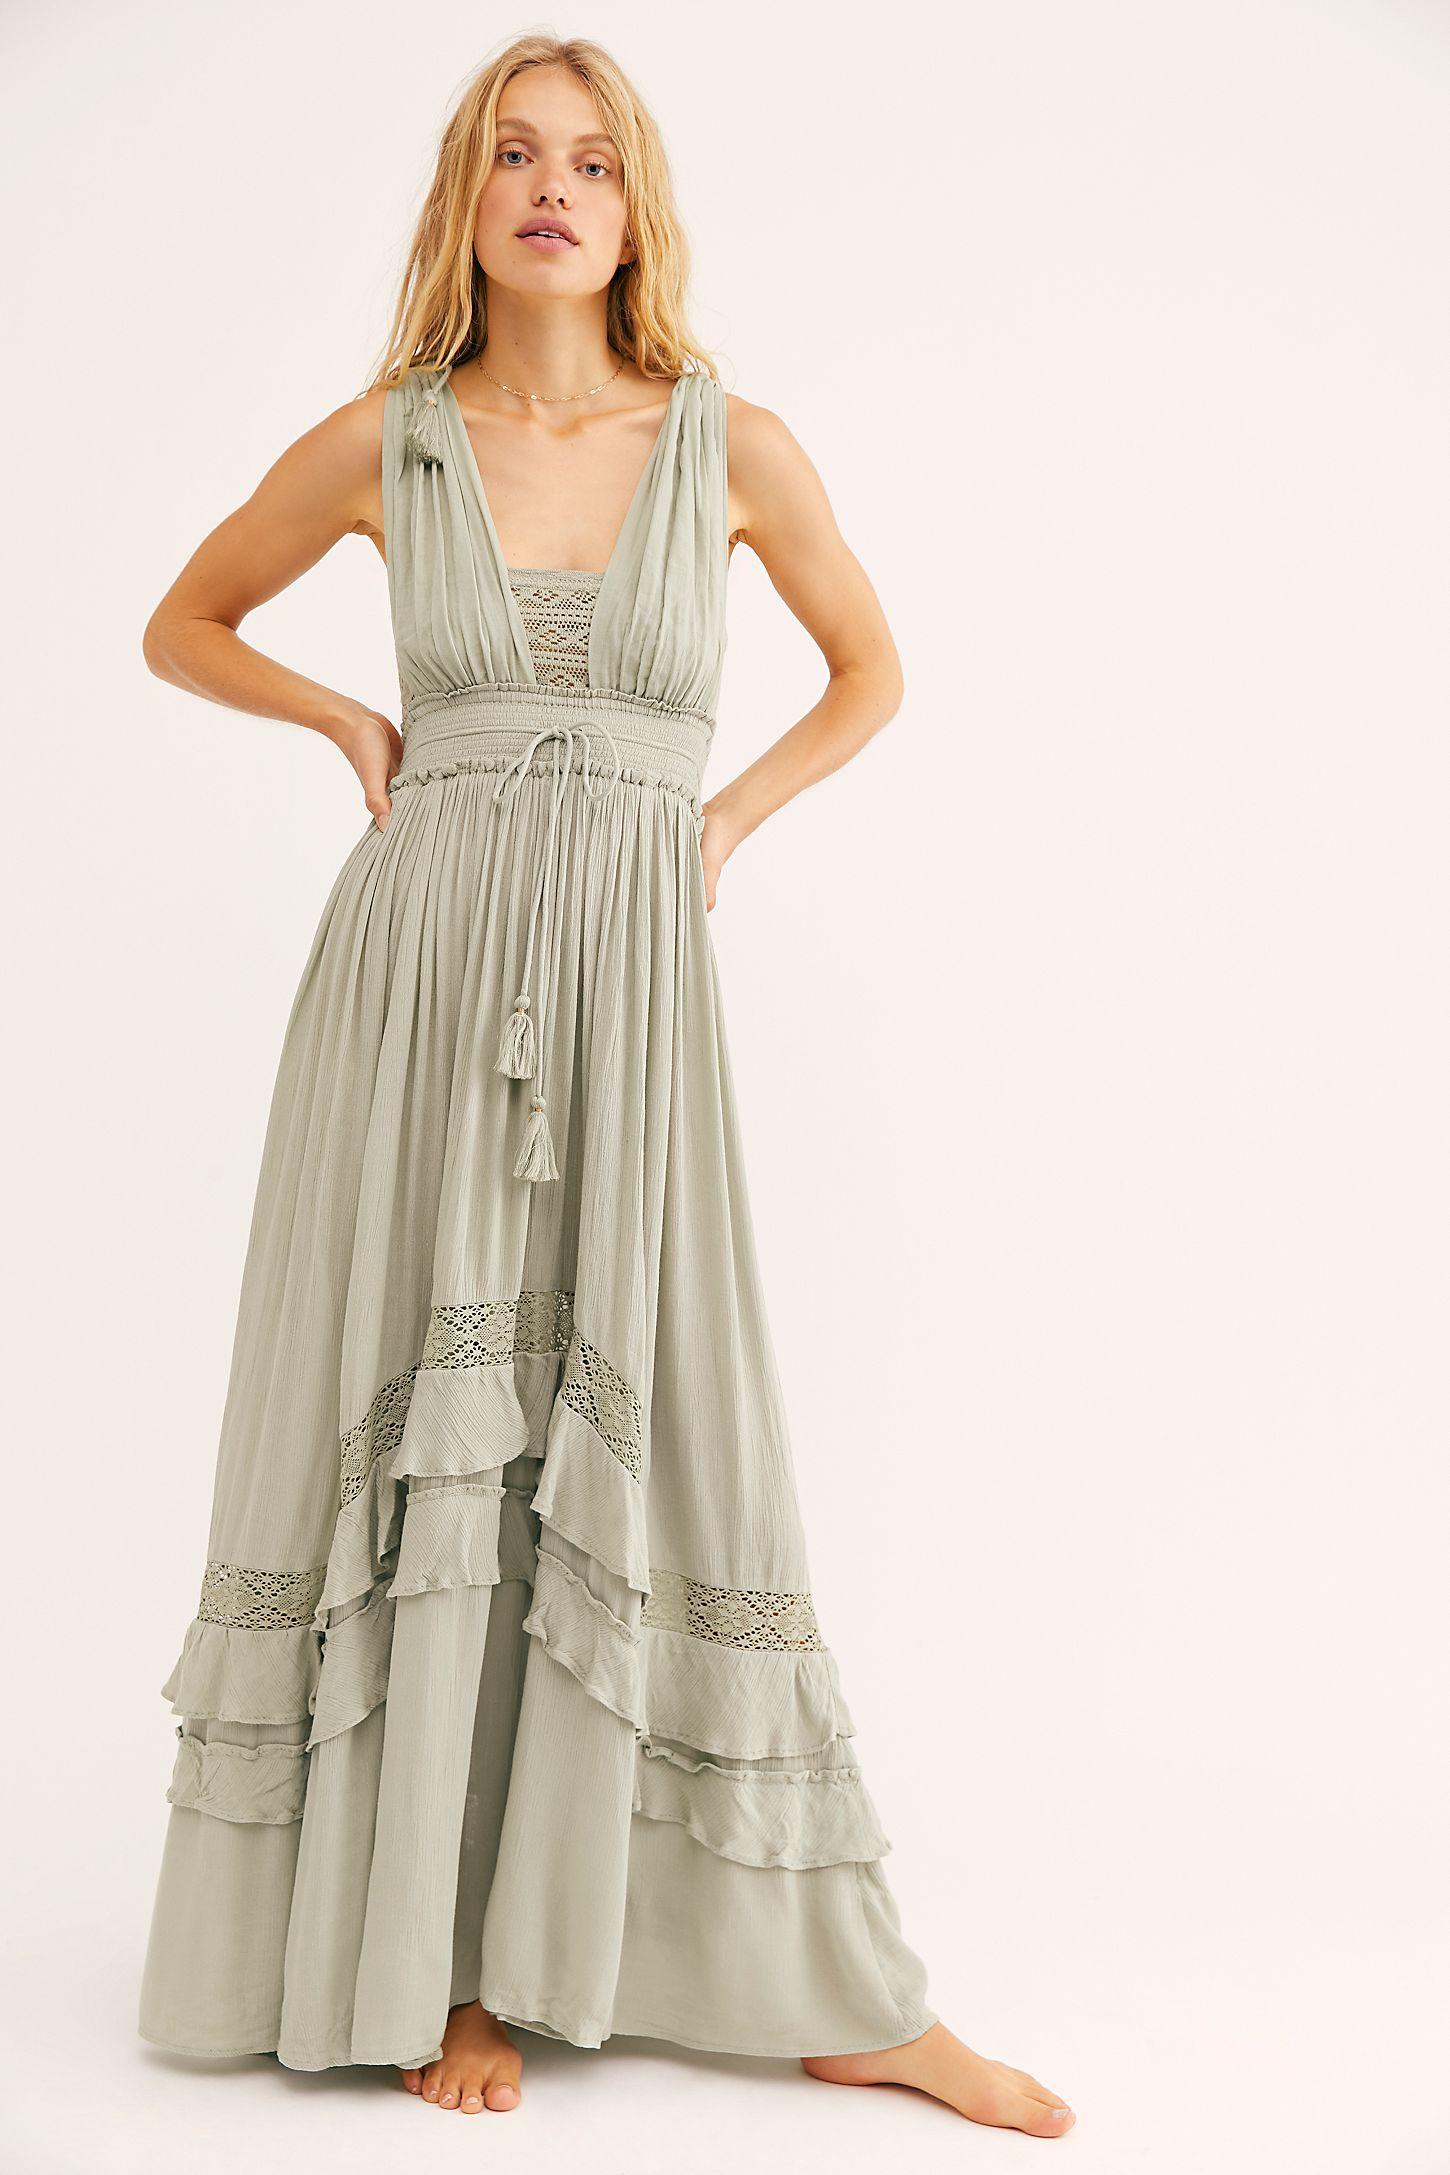 Santa Maria Maxi Dress Maxi Dress Maternity Dresses For Photoshoot Dresses [ 2175 x 1450 Pixel ]